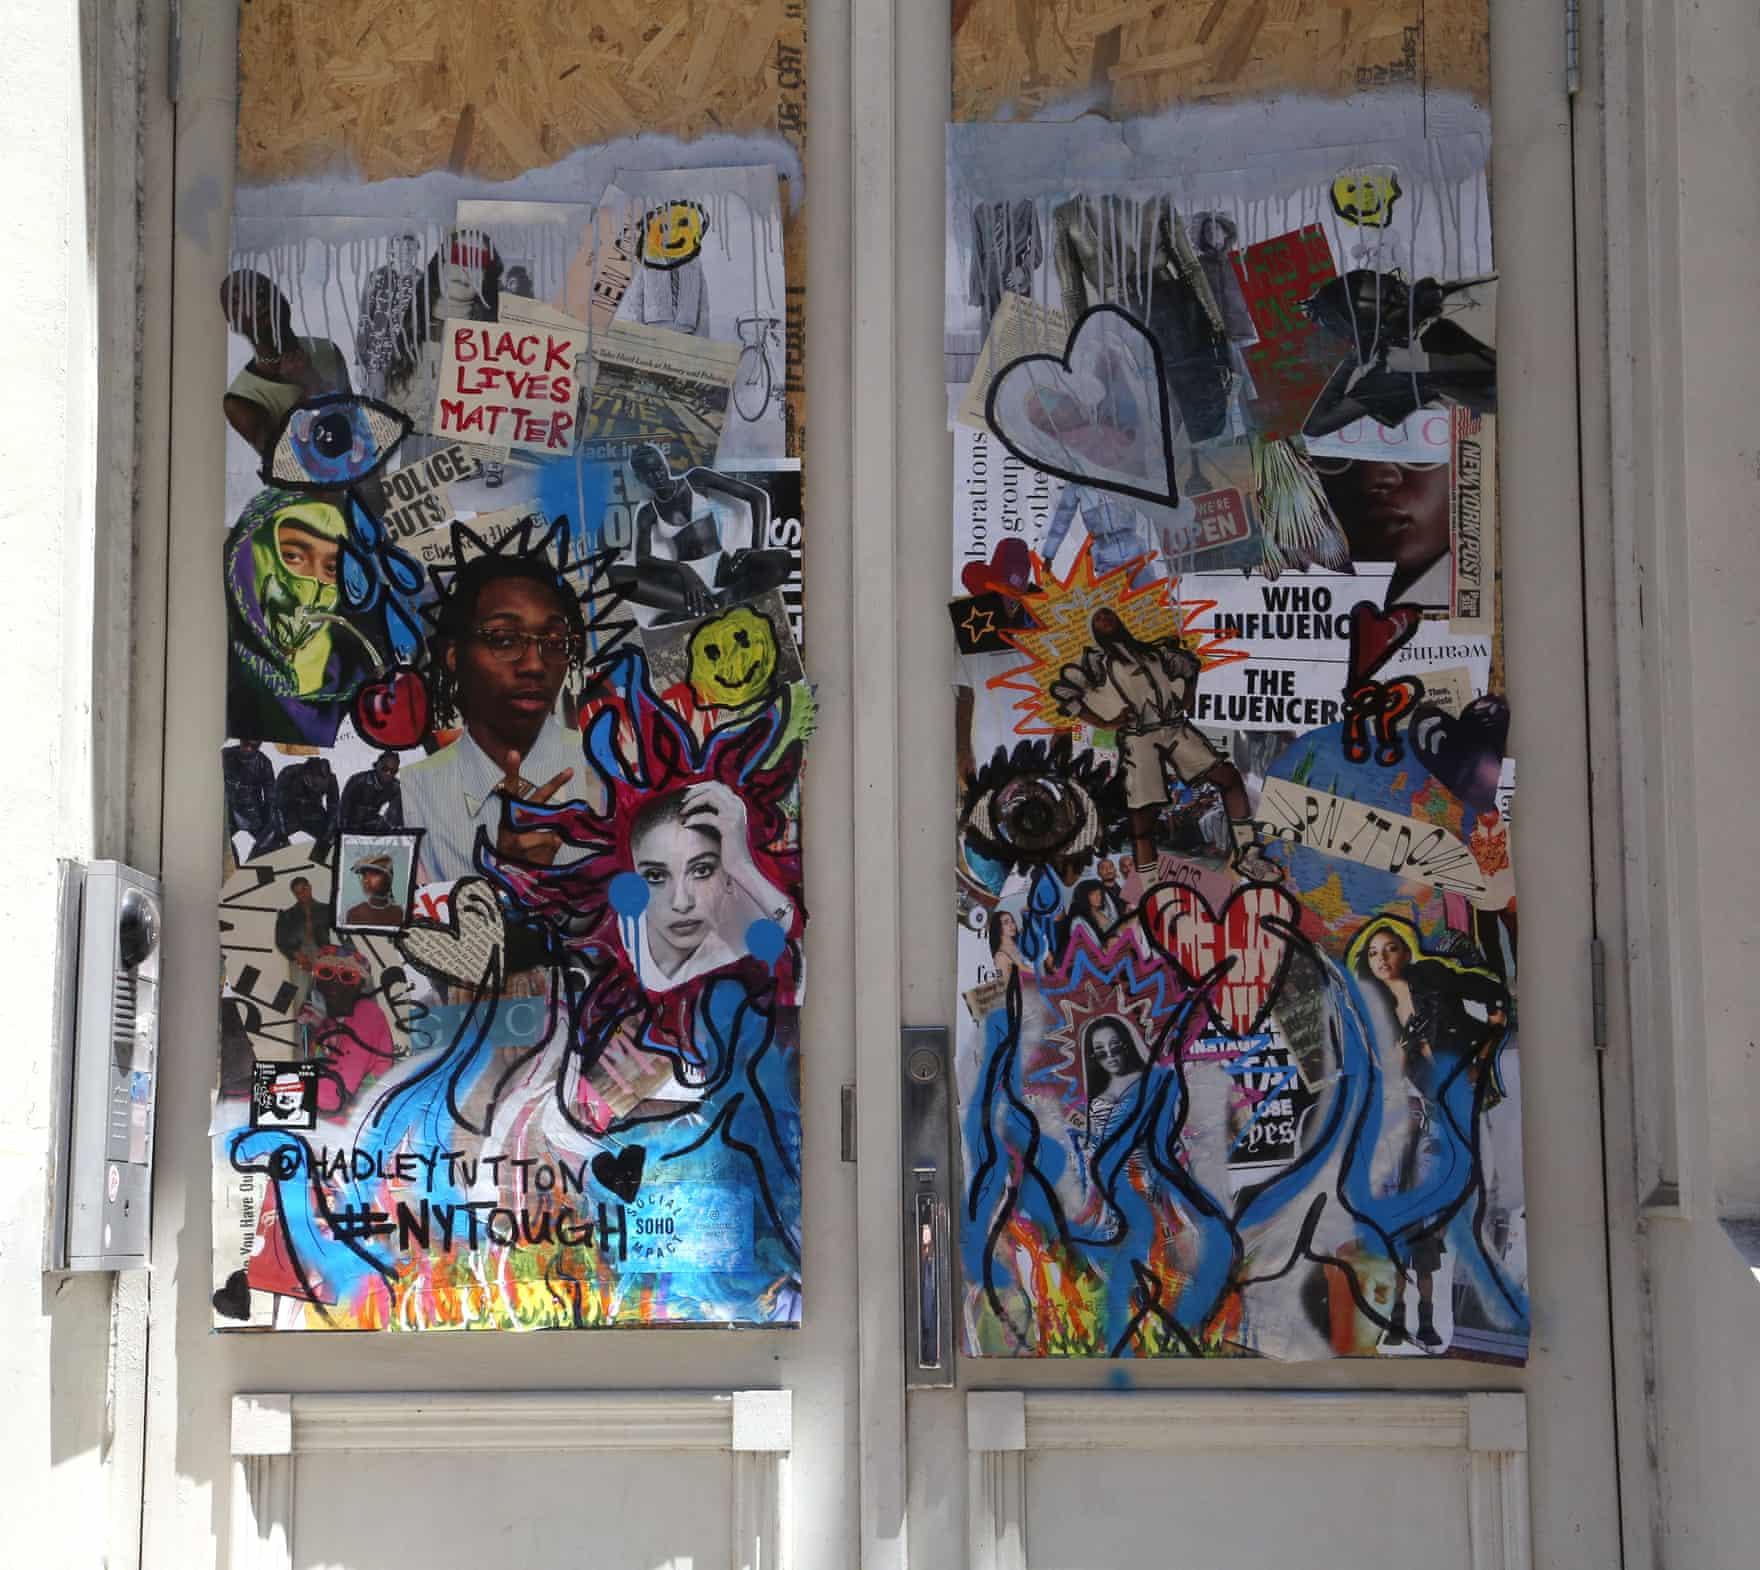 New York Graffiti Blacklivesmatter14